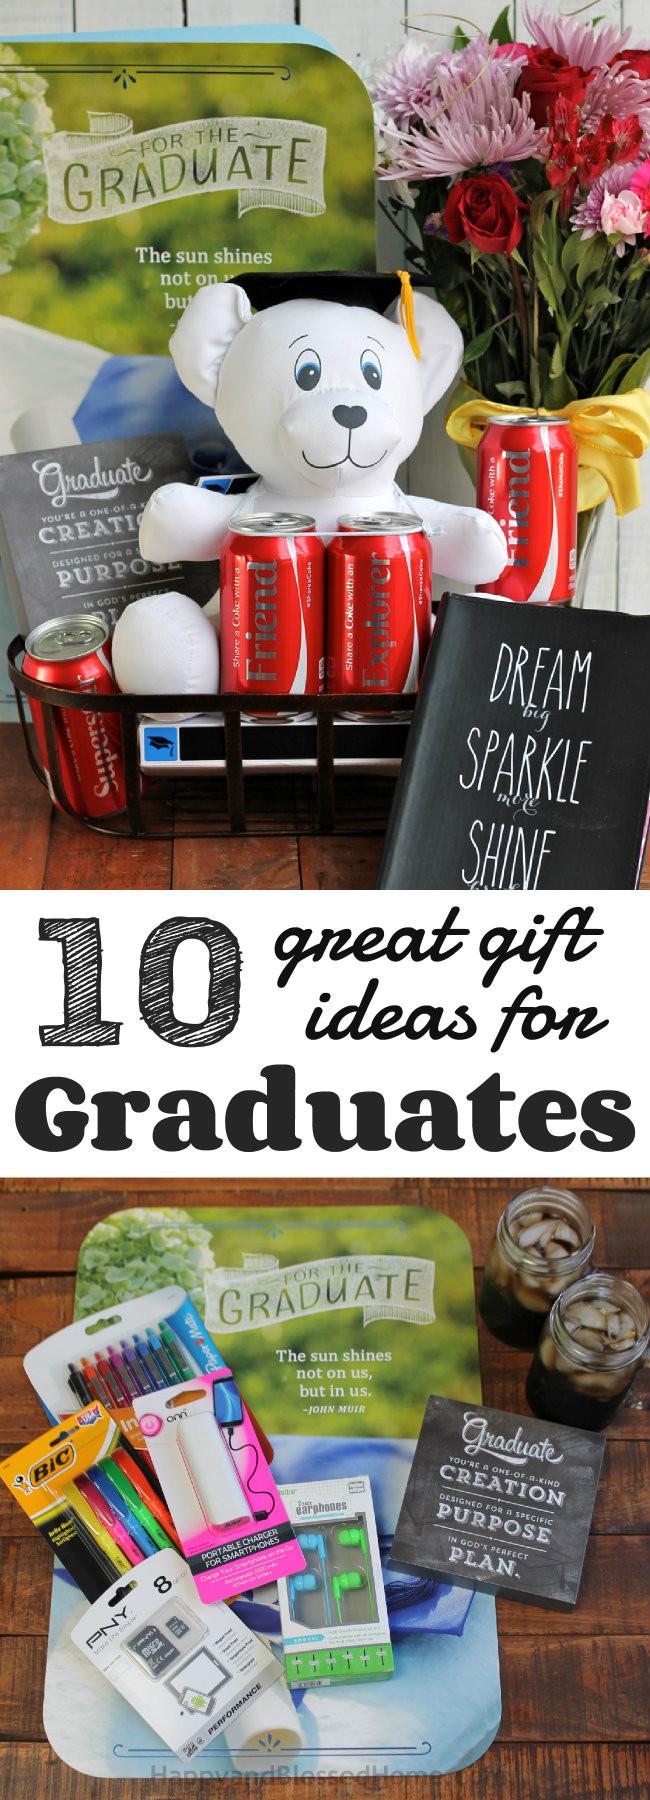 Inexpensive Graduation Gift Ideas  10 Great Gift Ideas for Graduates